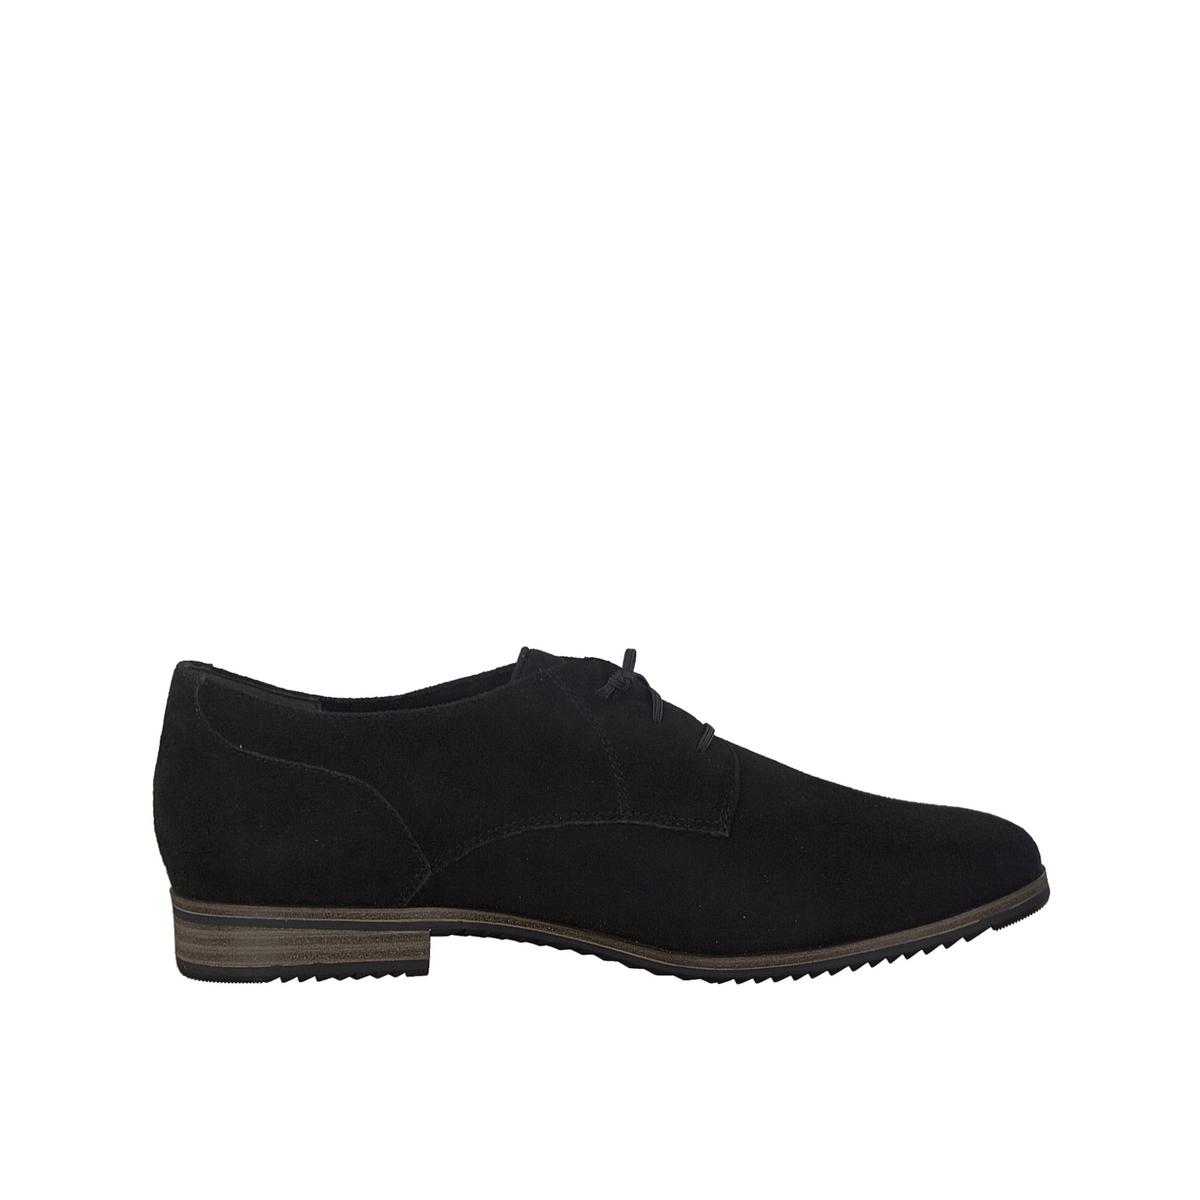 Ботинки-дерби из кожи Pistil ботинки дерби из кожи dagonet